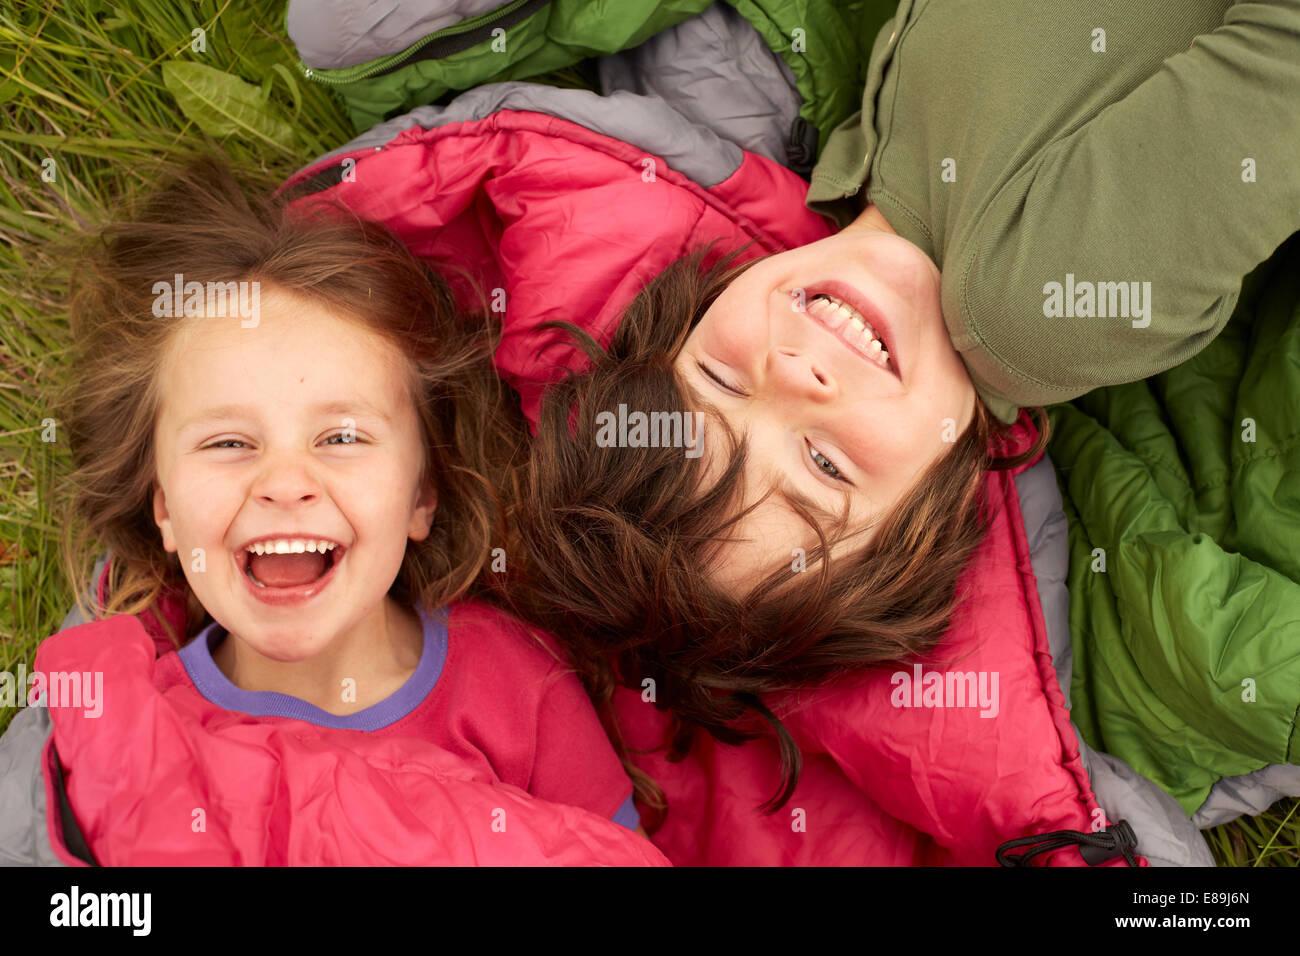 Laughing kids sentando en sacos de dormir Imagen De Stock